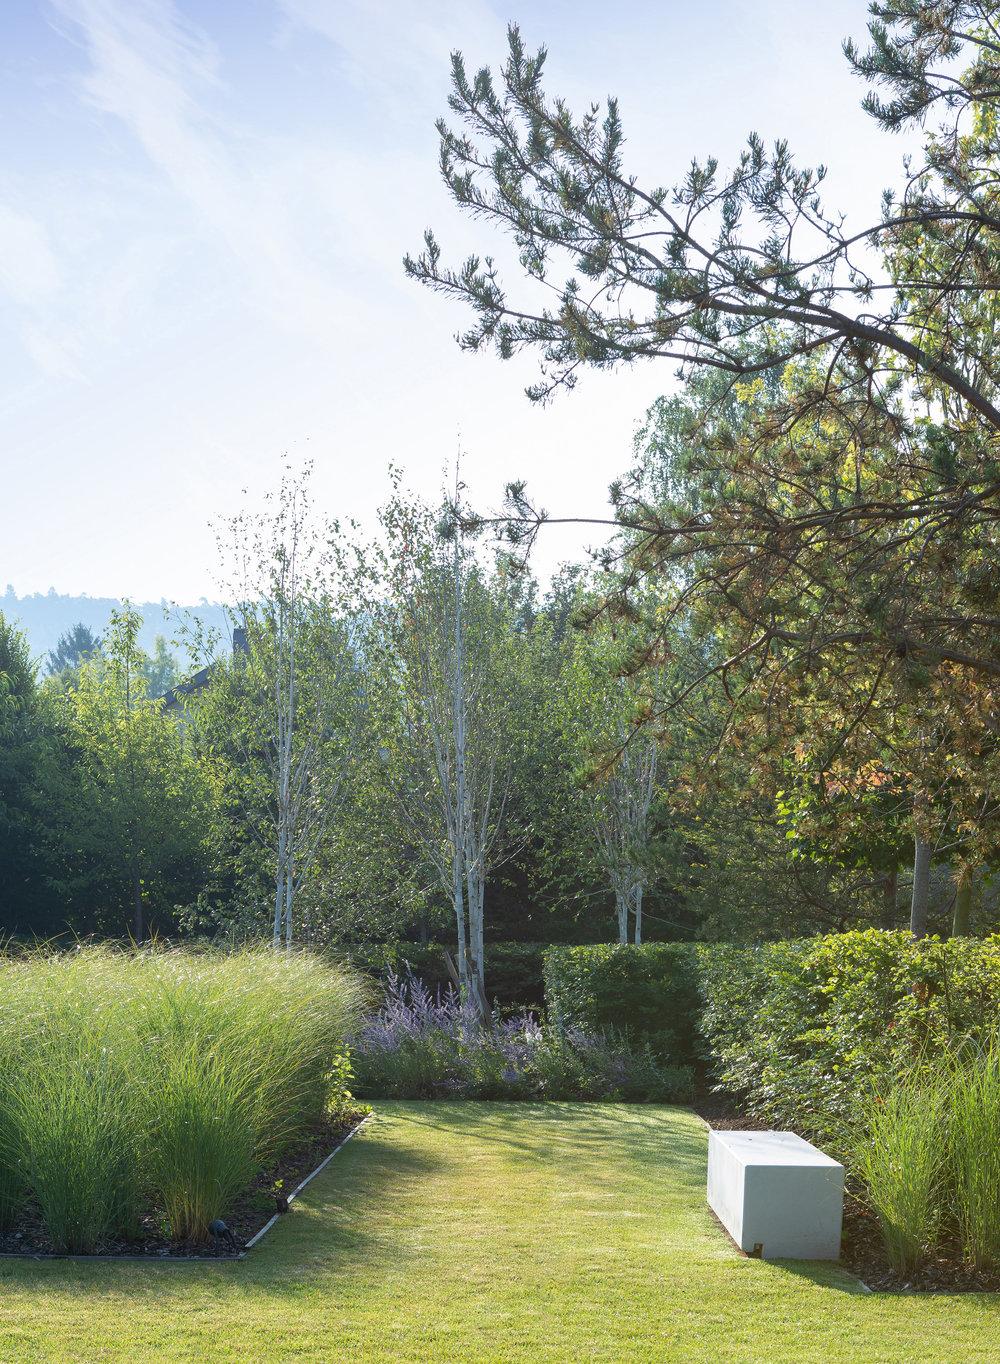 luxembourg_terraces_gardens_outdoor_landscape_designer_christophe_gautrand_5.jpg